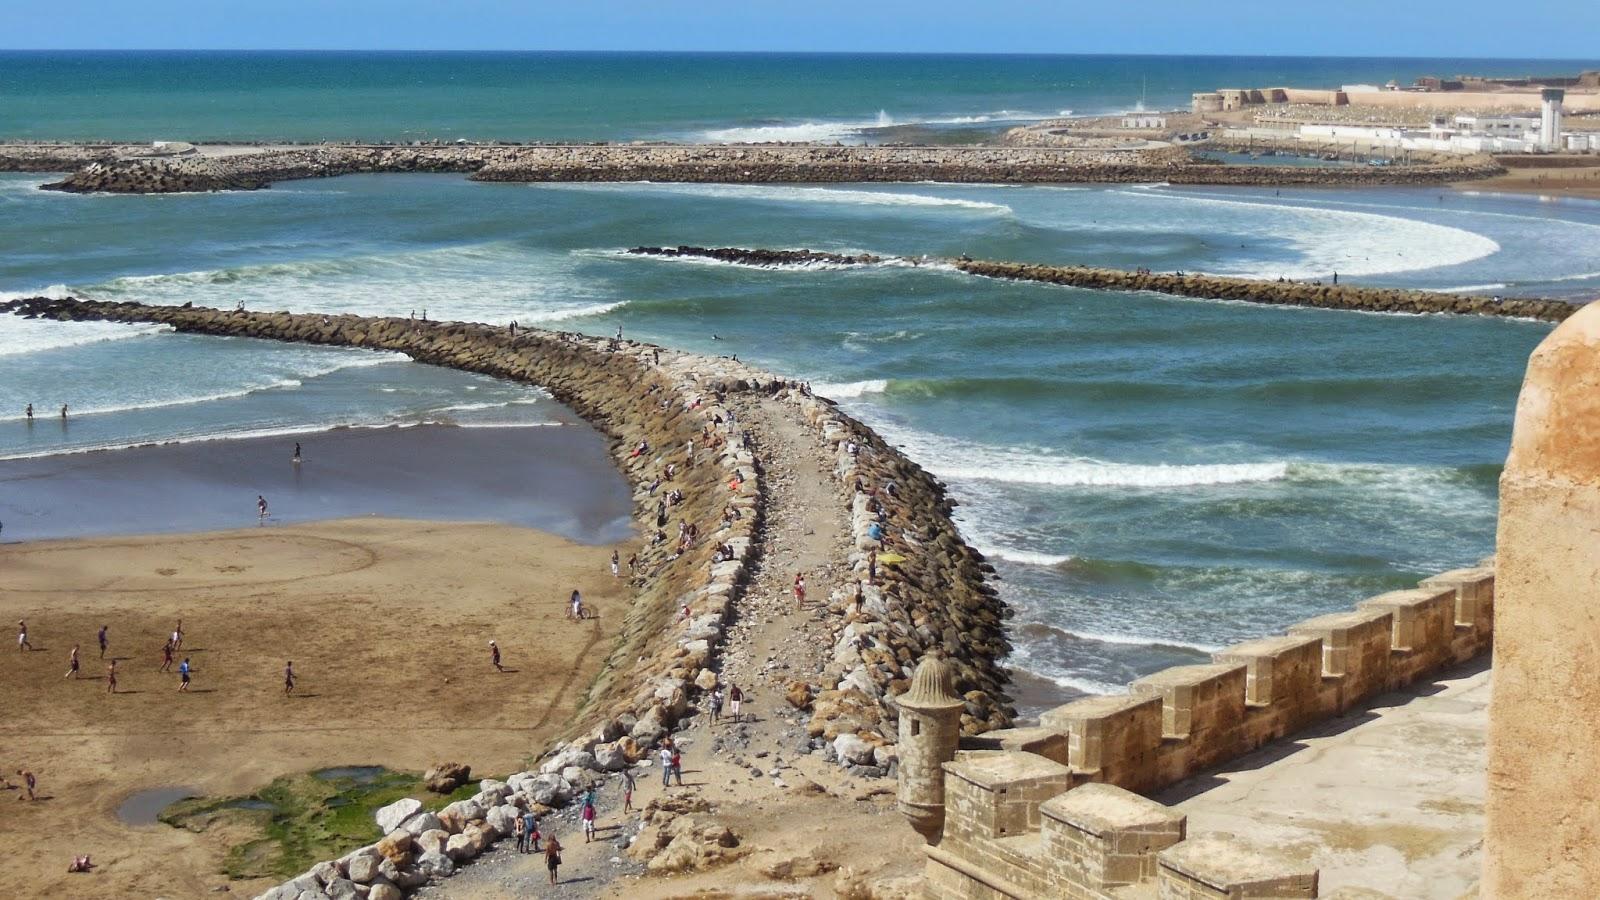 morocco-oudaya-rabat-beach1532100942